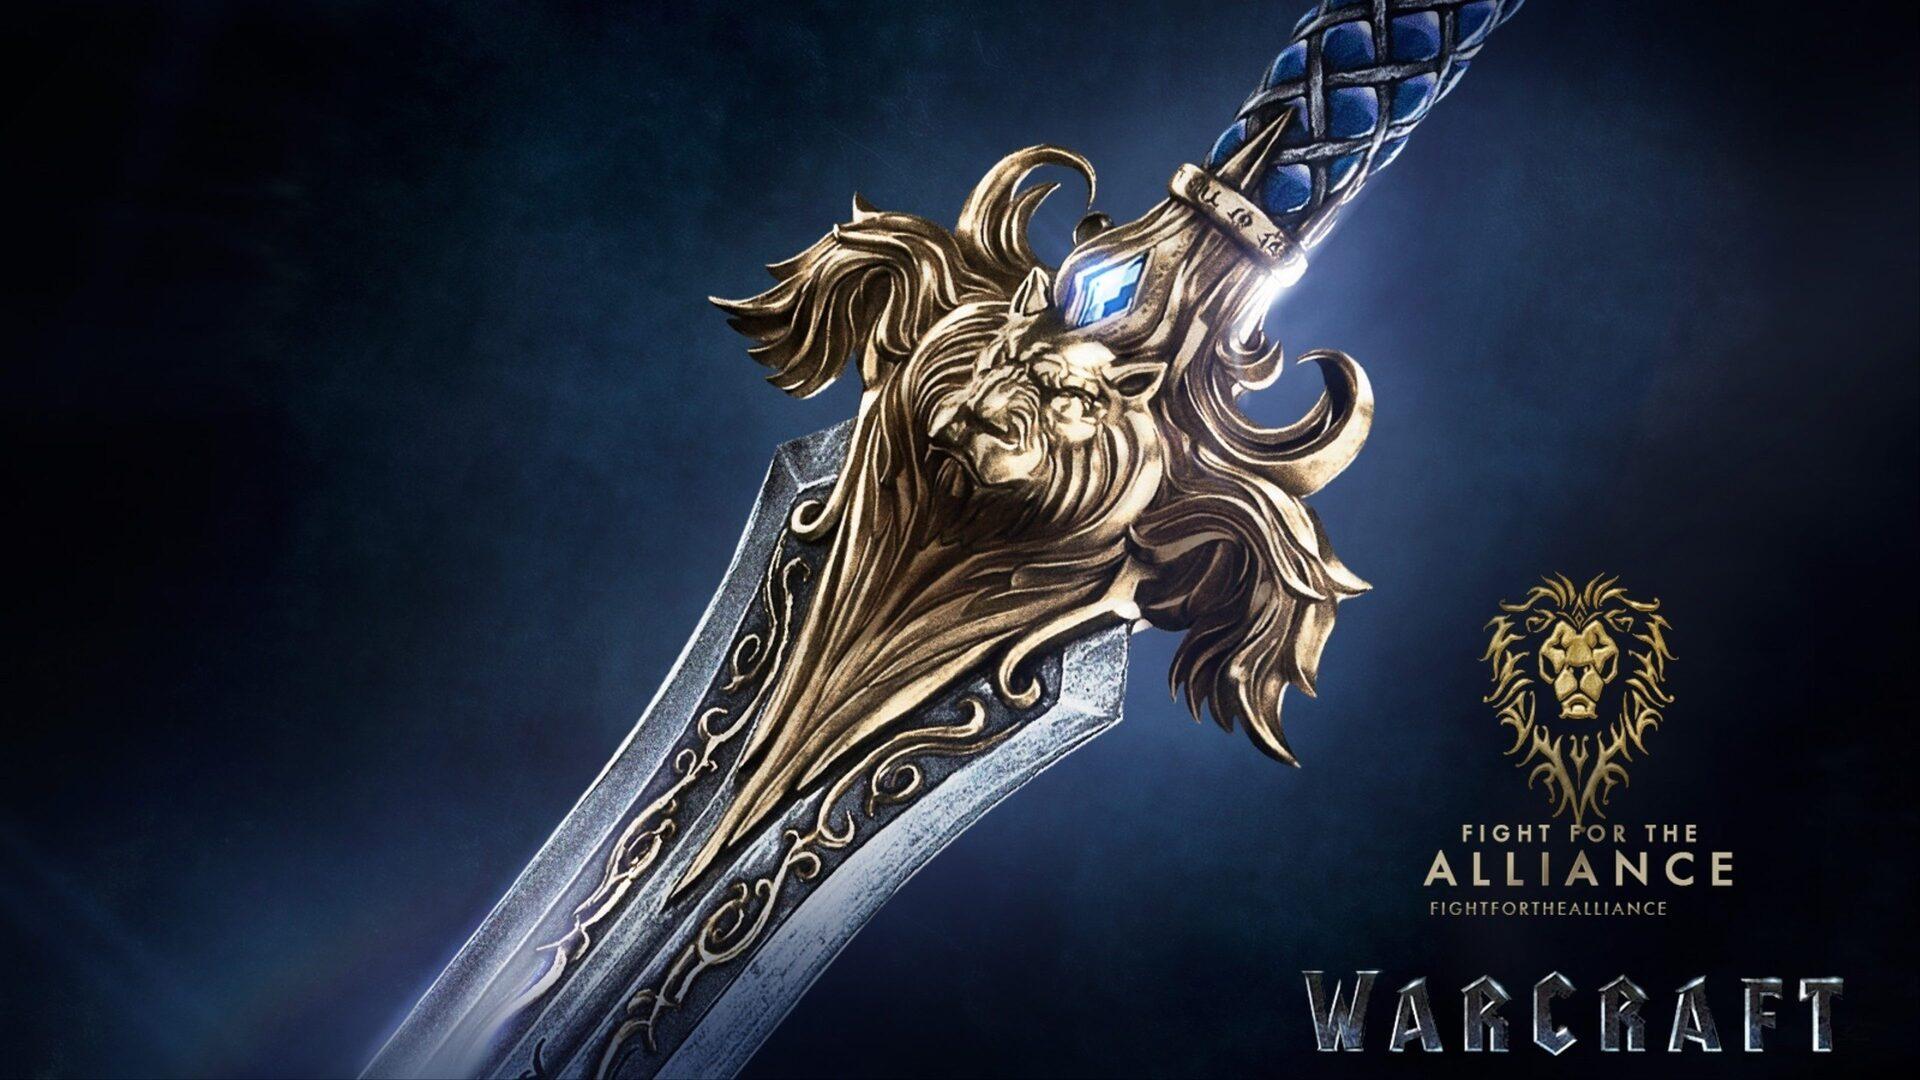 1080p world of warcraft alliance wallpaper